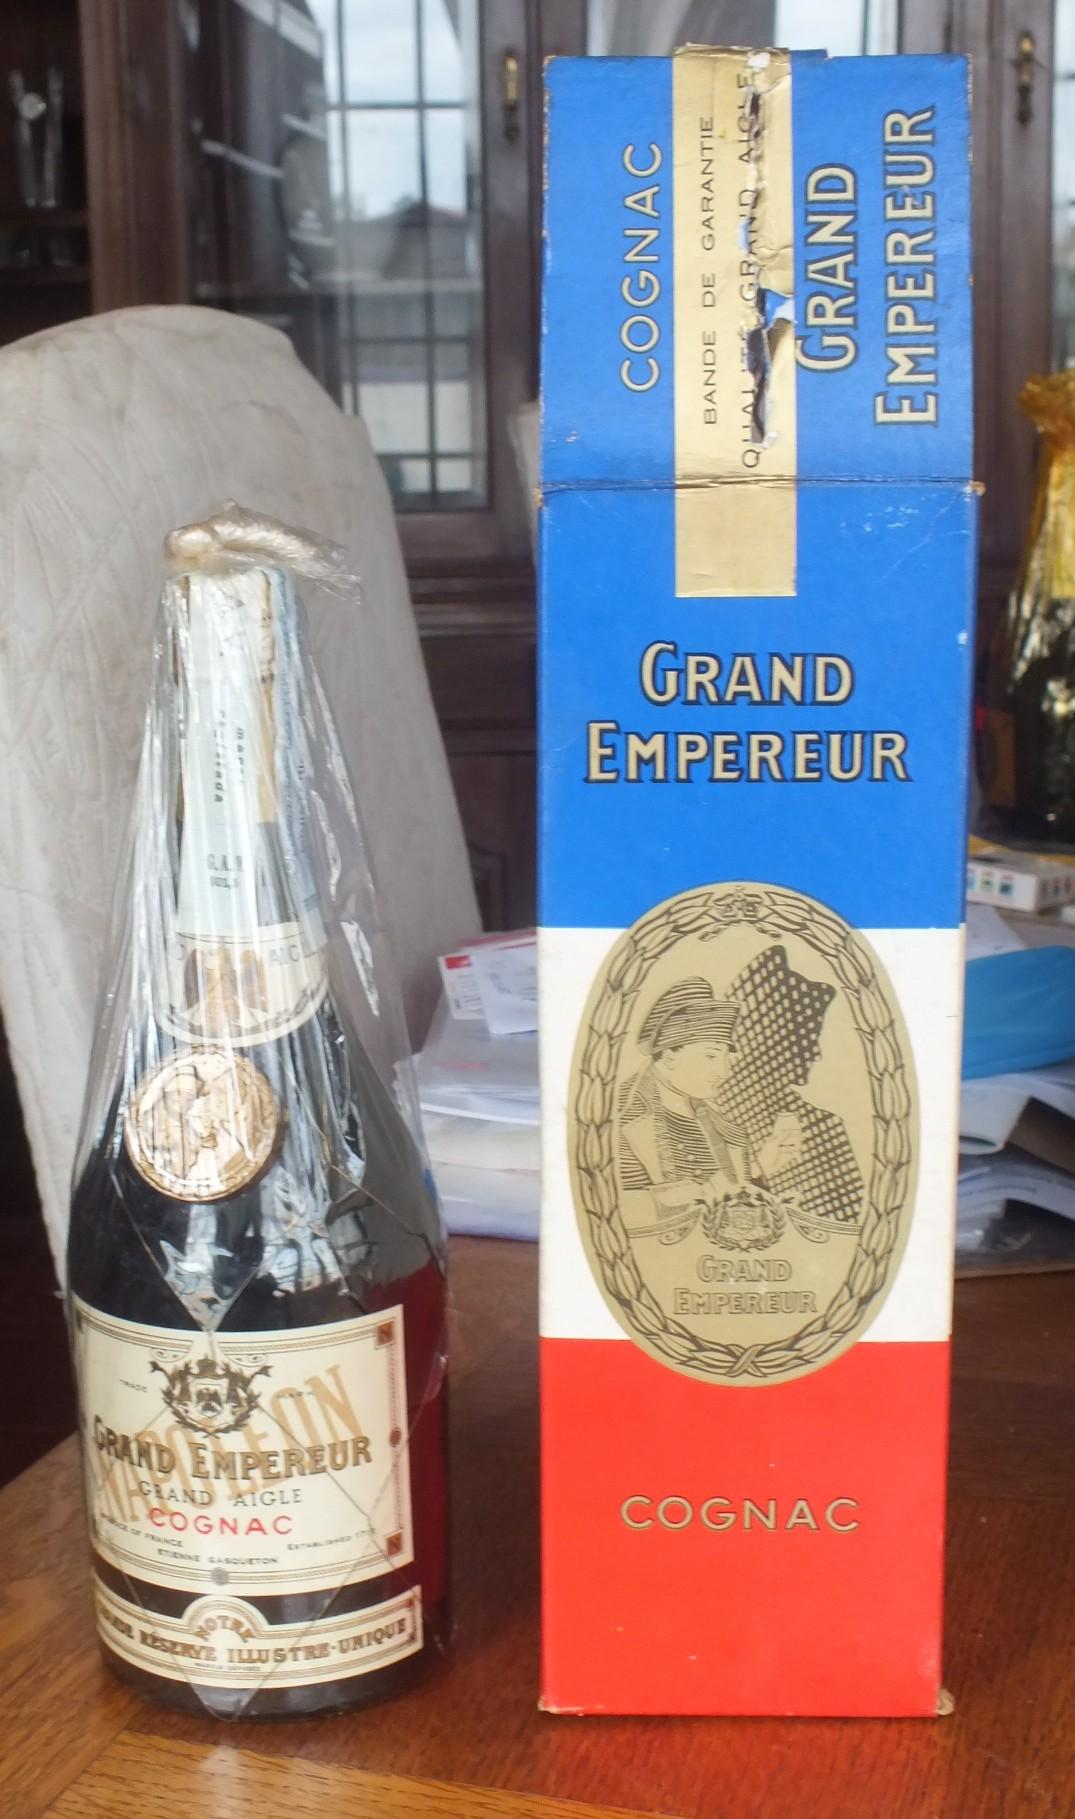 Gasqueton Napoleon (Grand Empereur Grand Aigle) Cognac